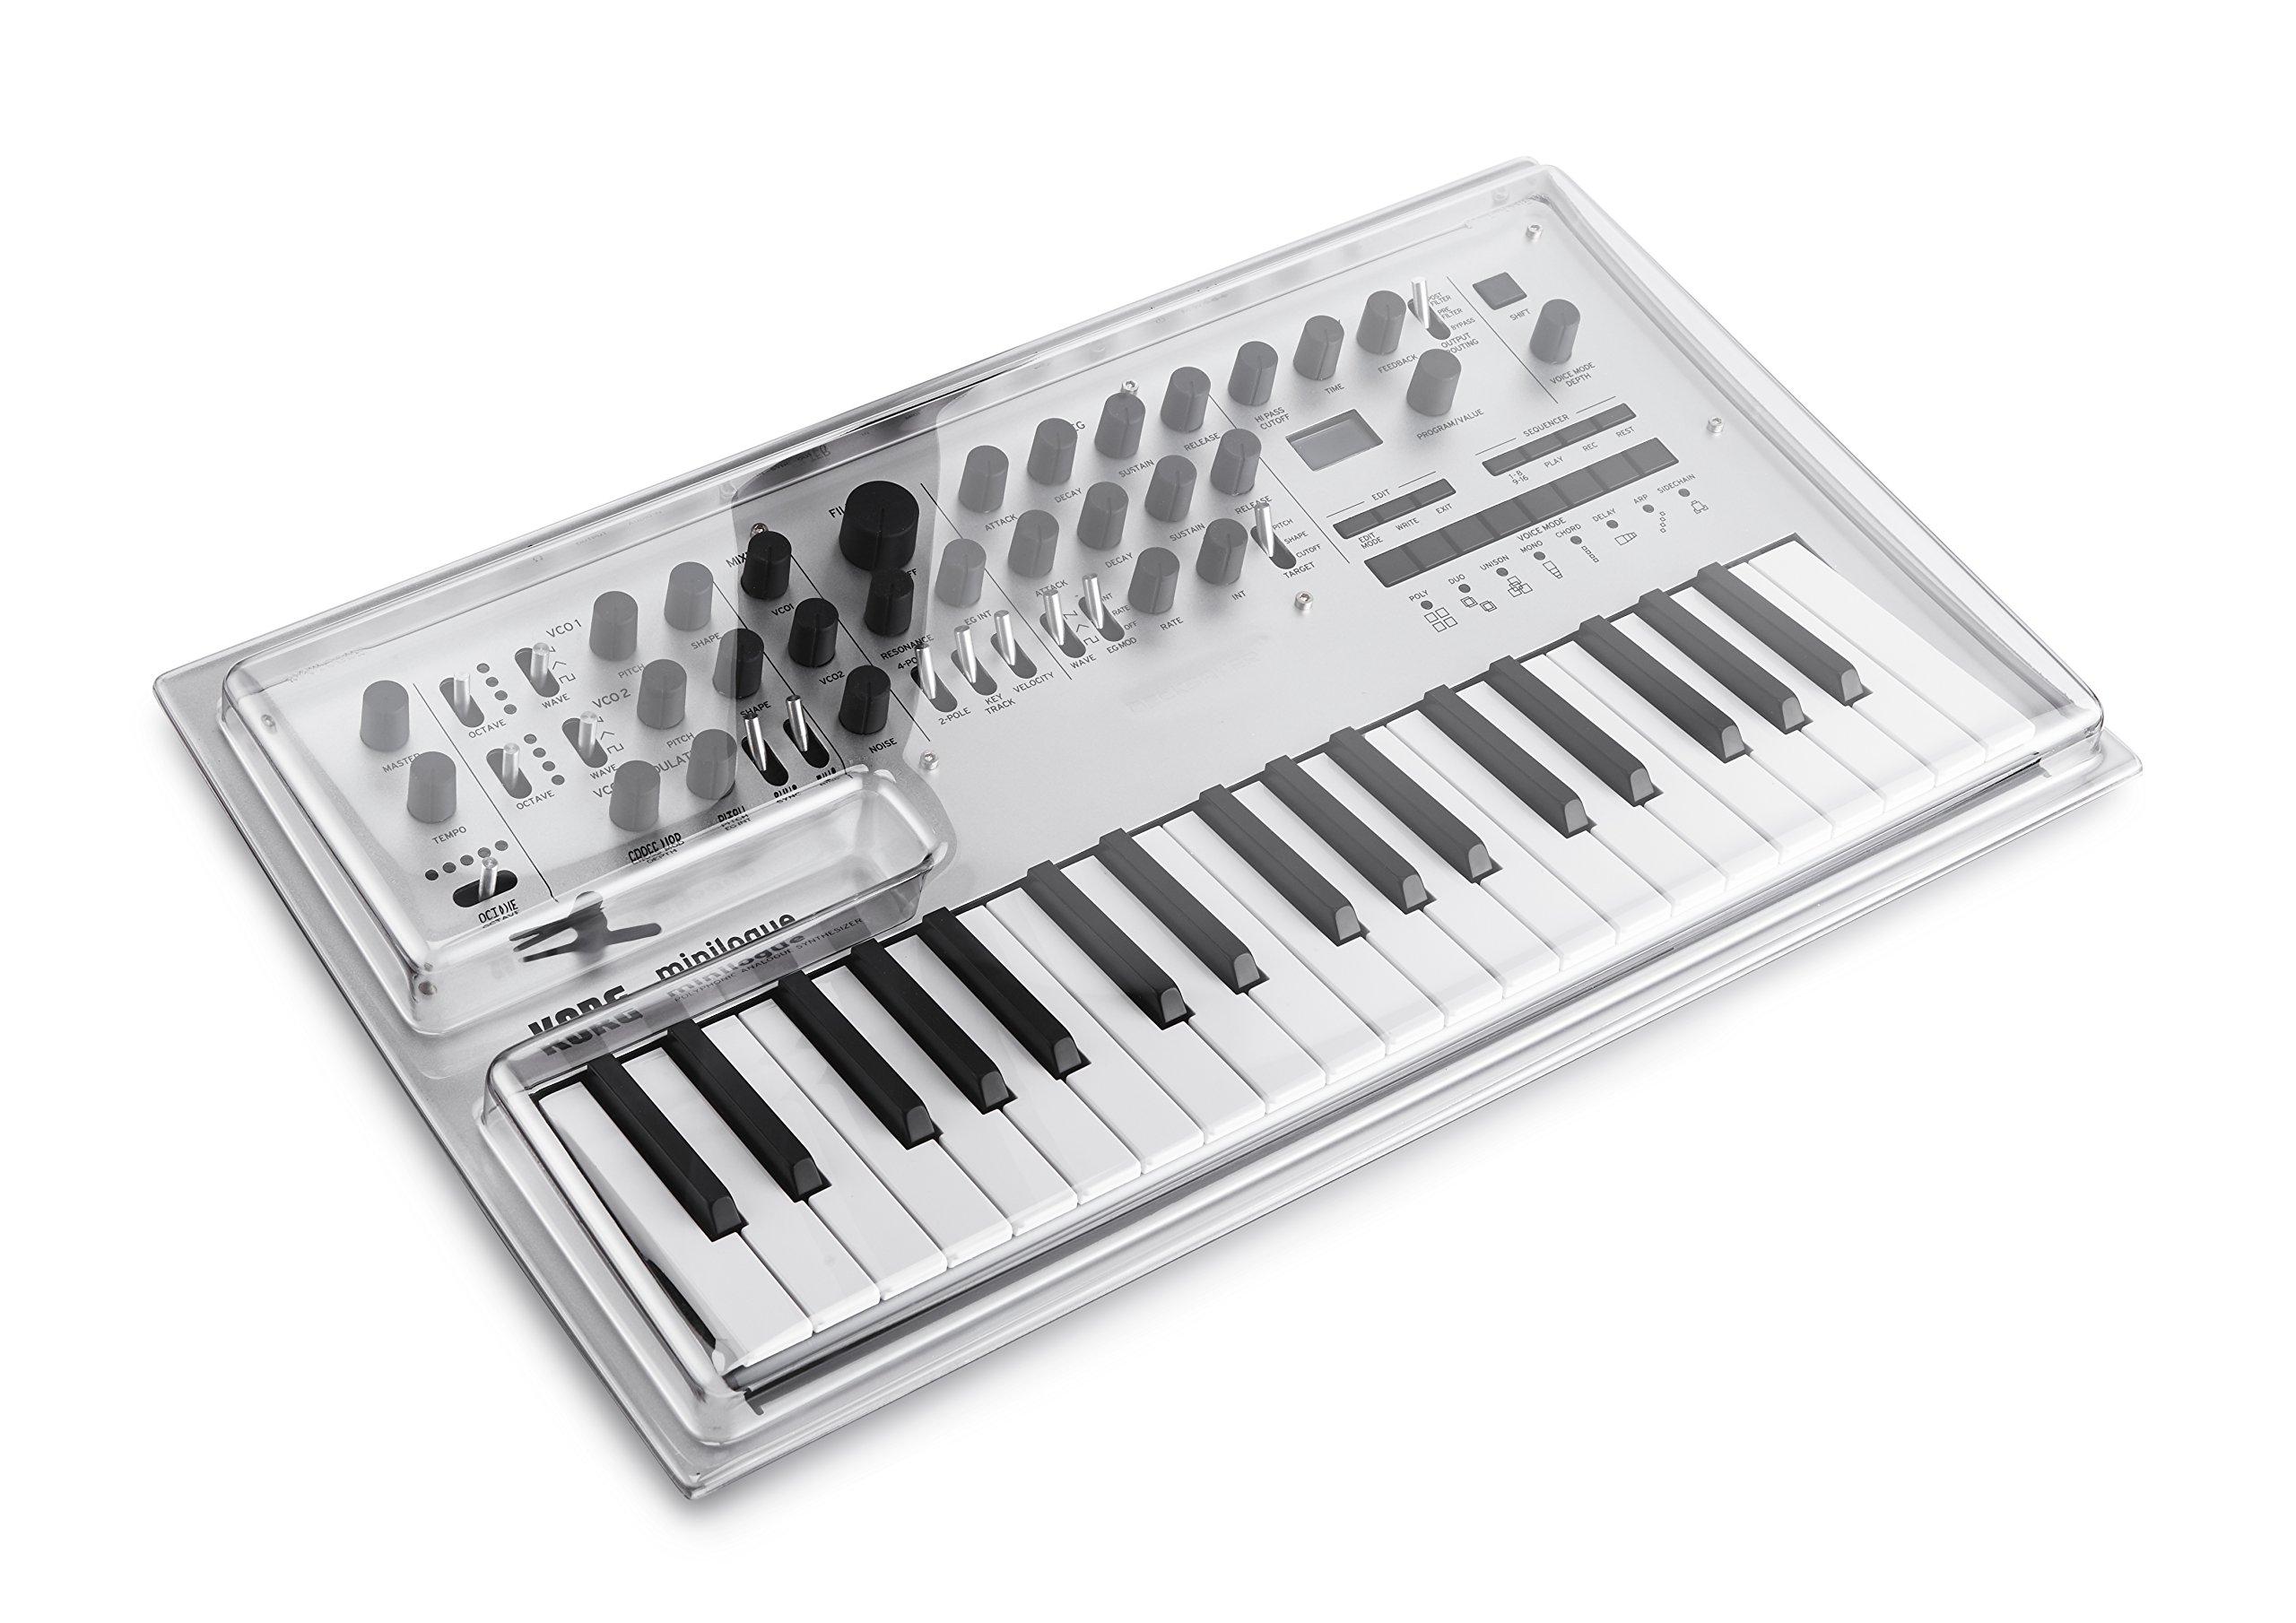 Decksaver DS-PC-MINILOGUE Korg Minilogue Synthesizer Cover by Decksaver